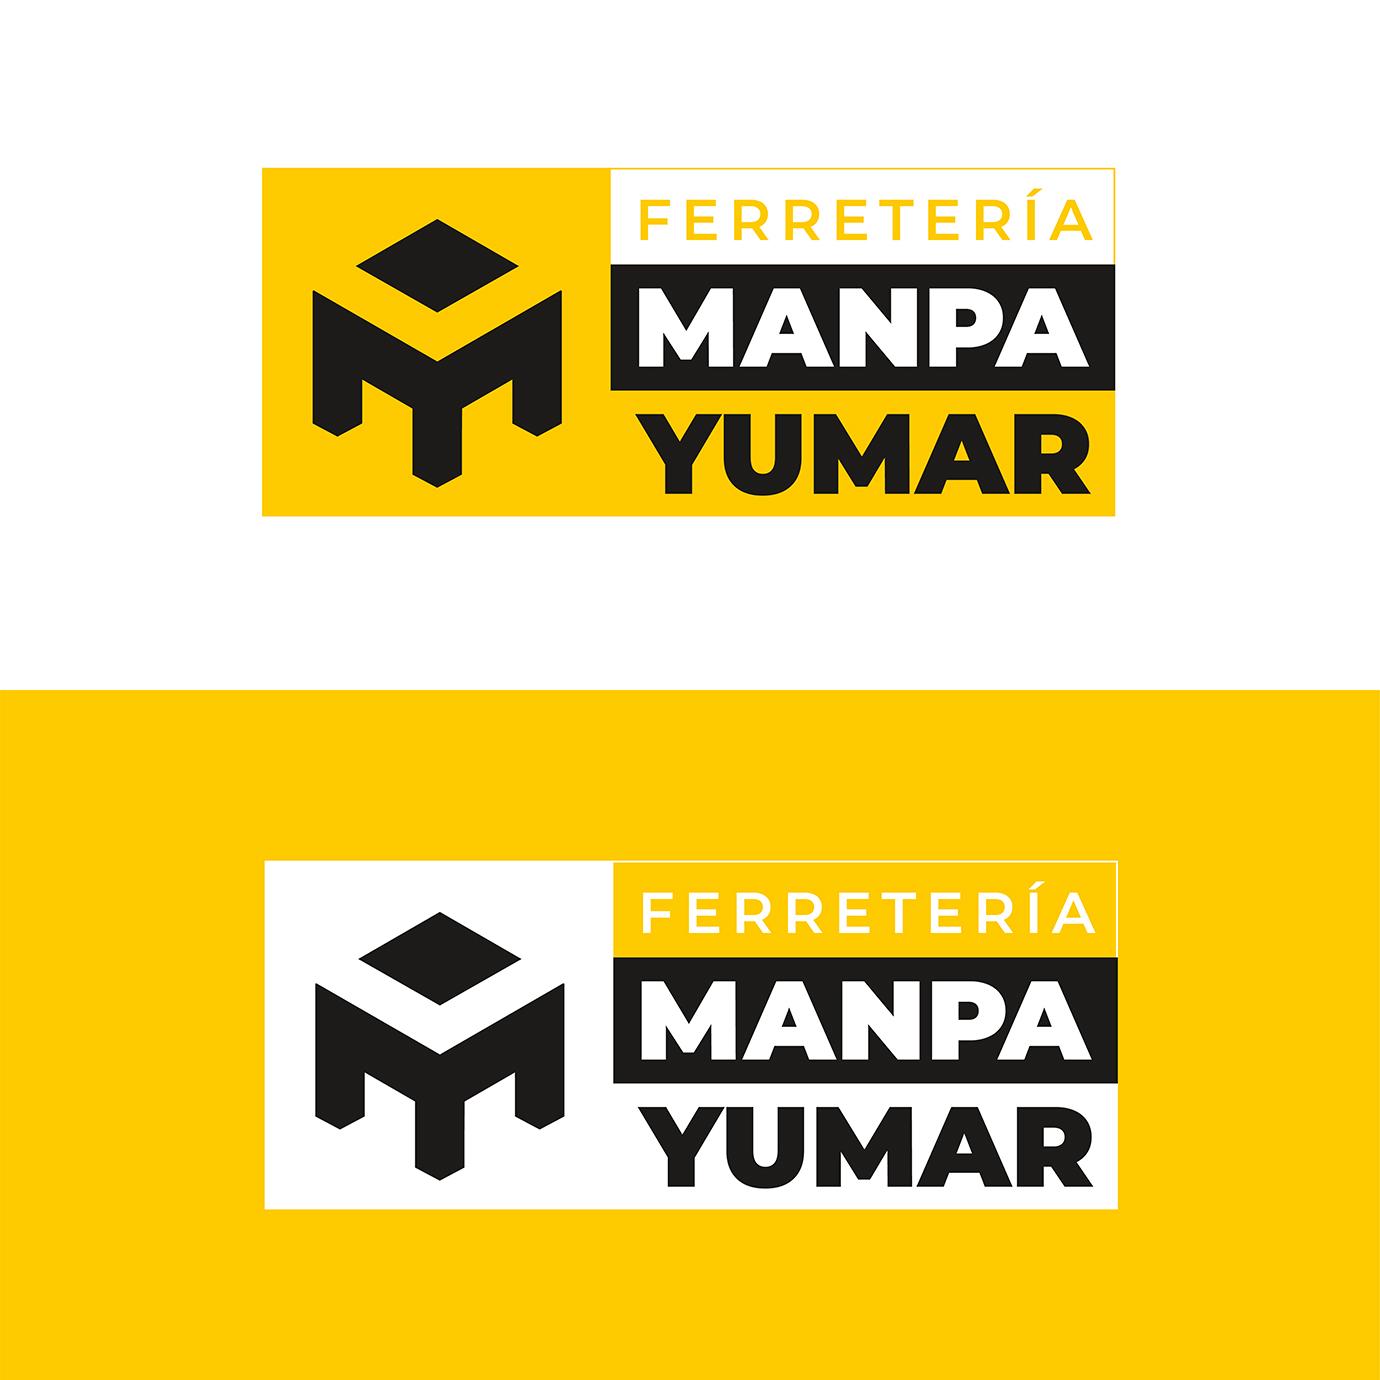 manpa-yumar-logo